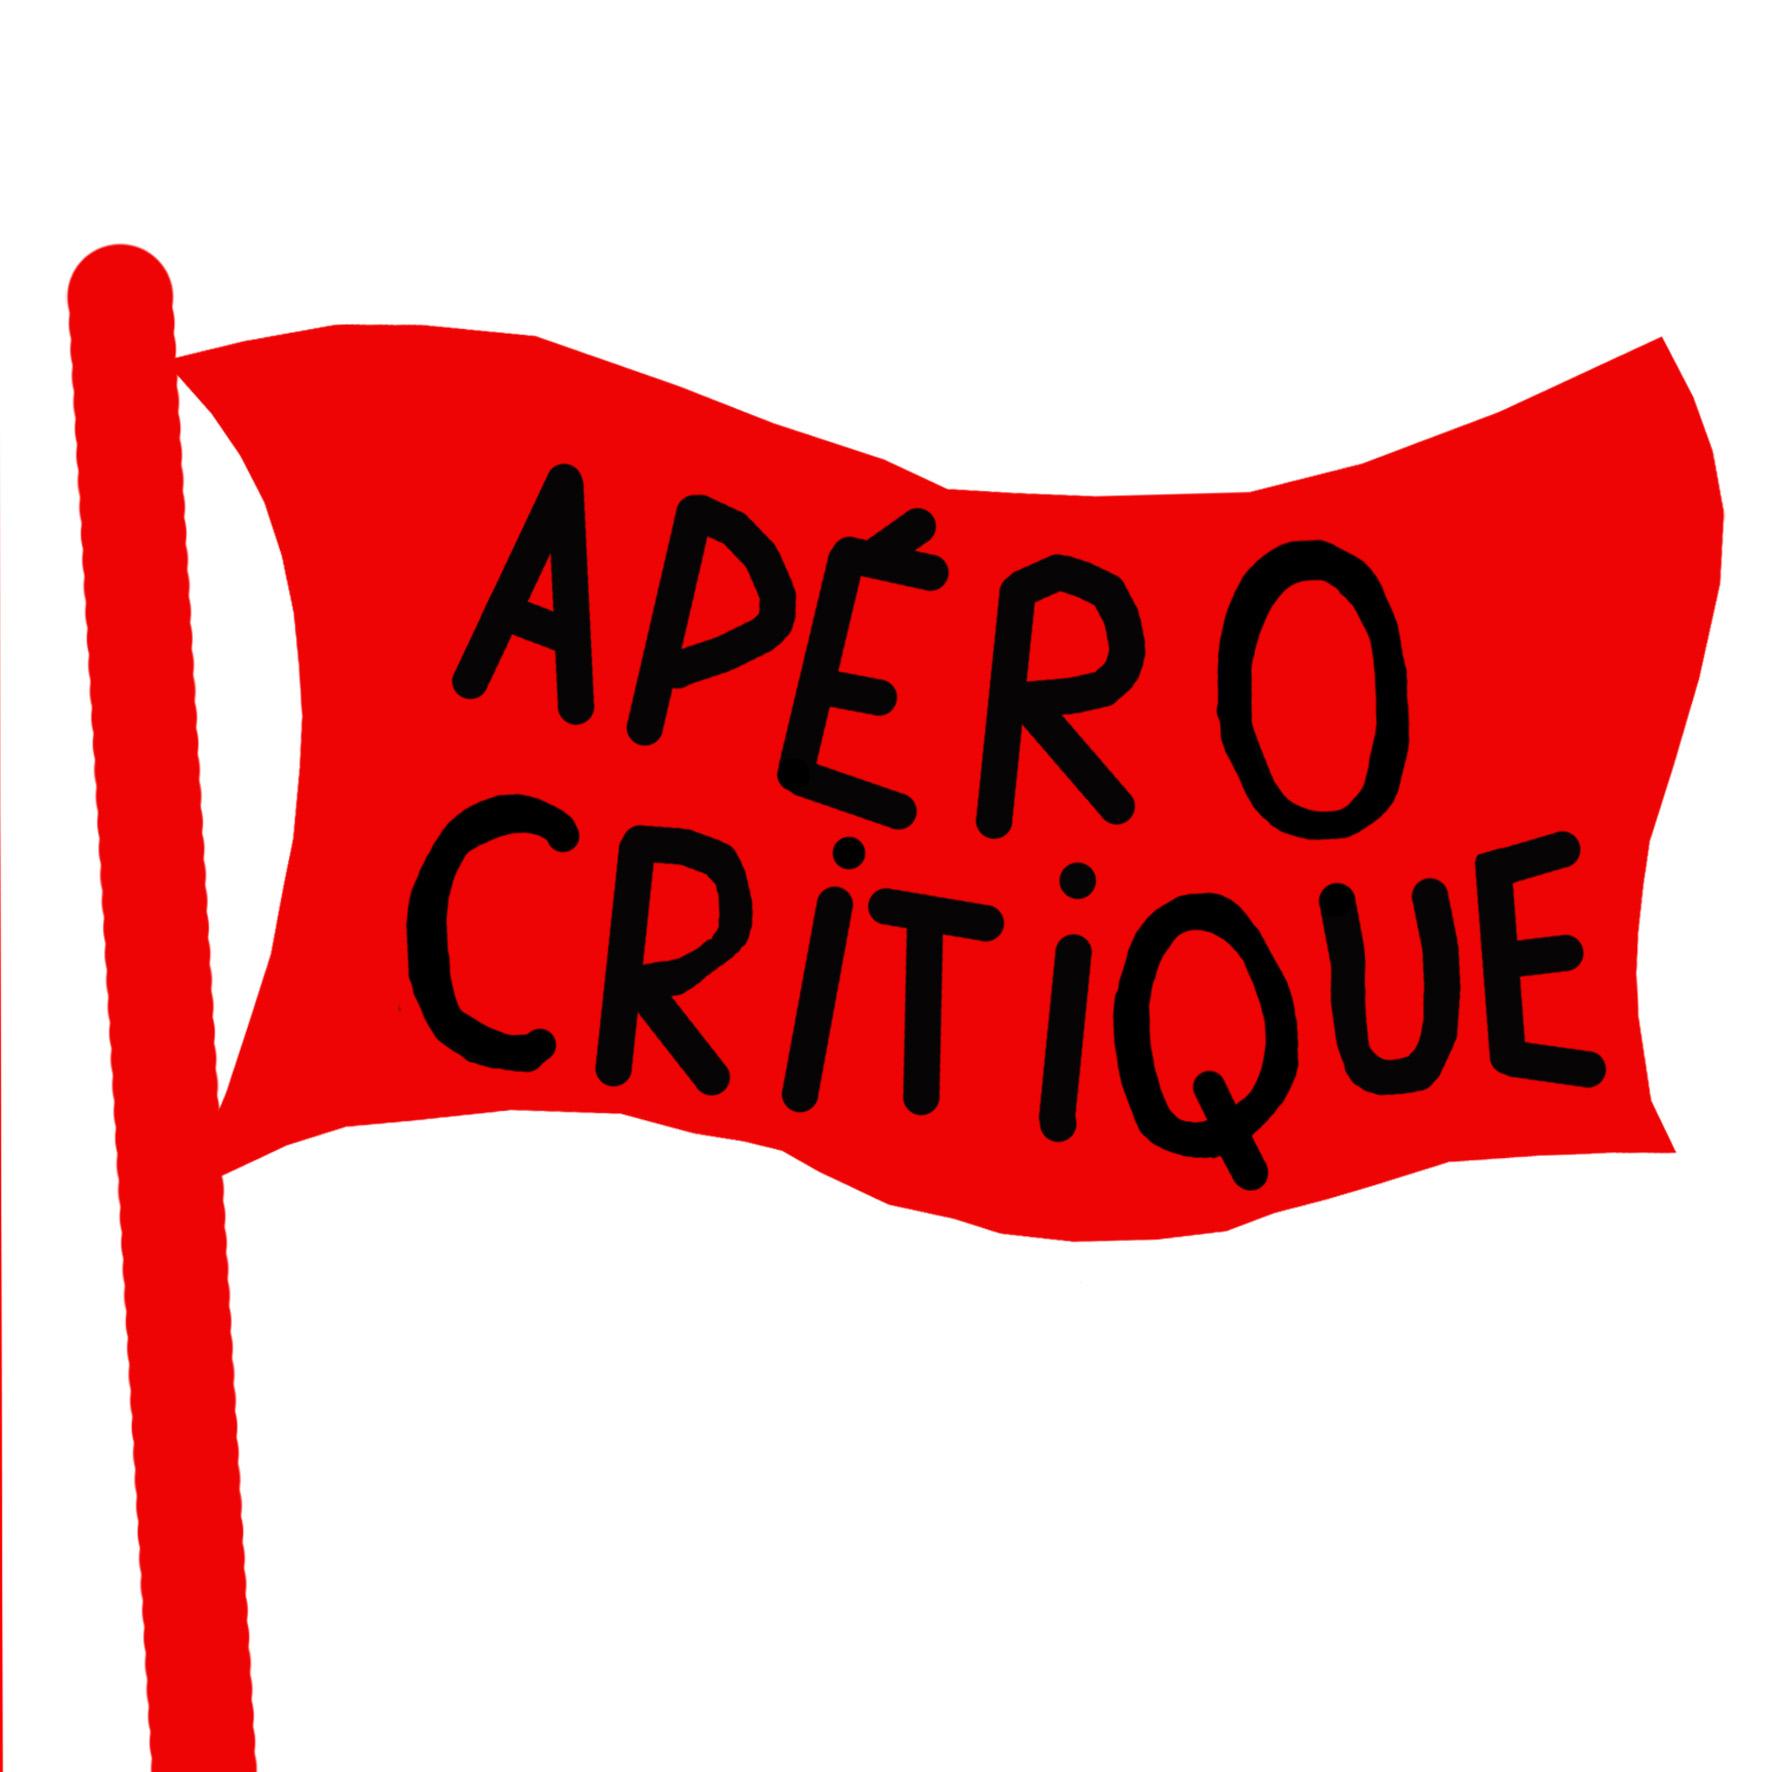 apero_critique_carre_newsletter